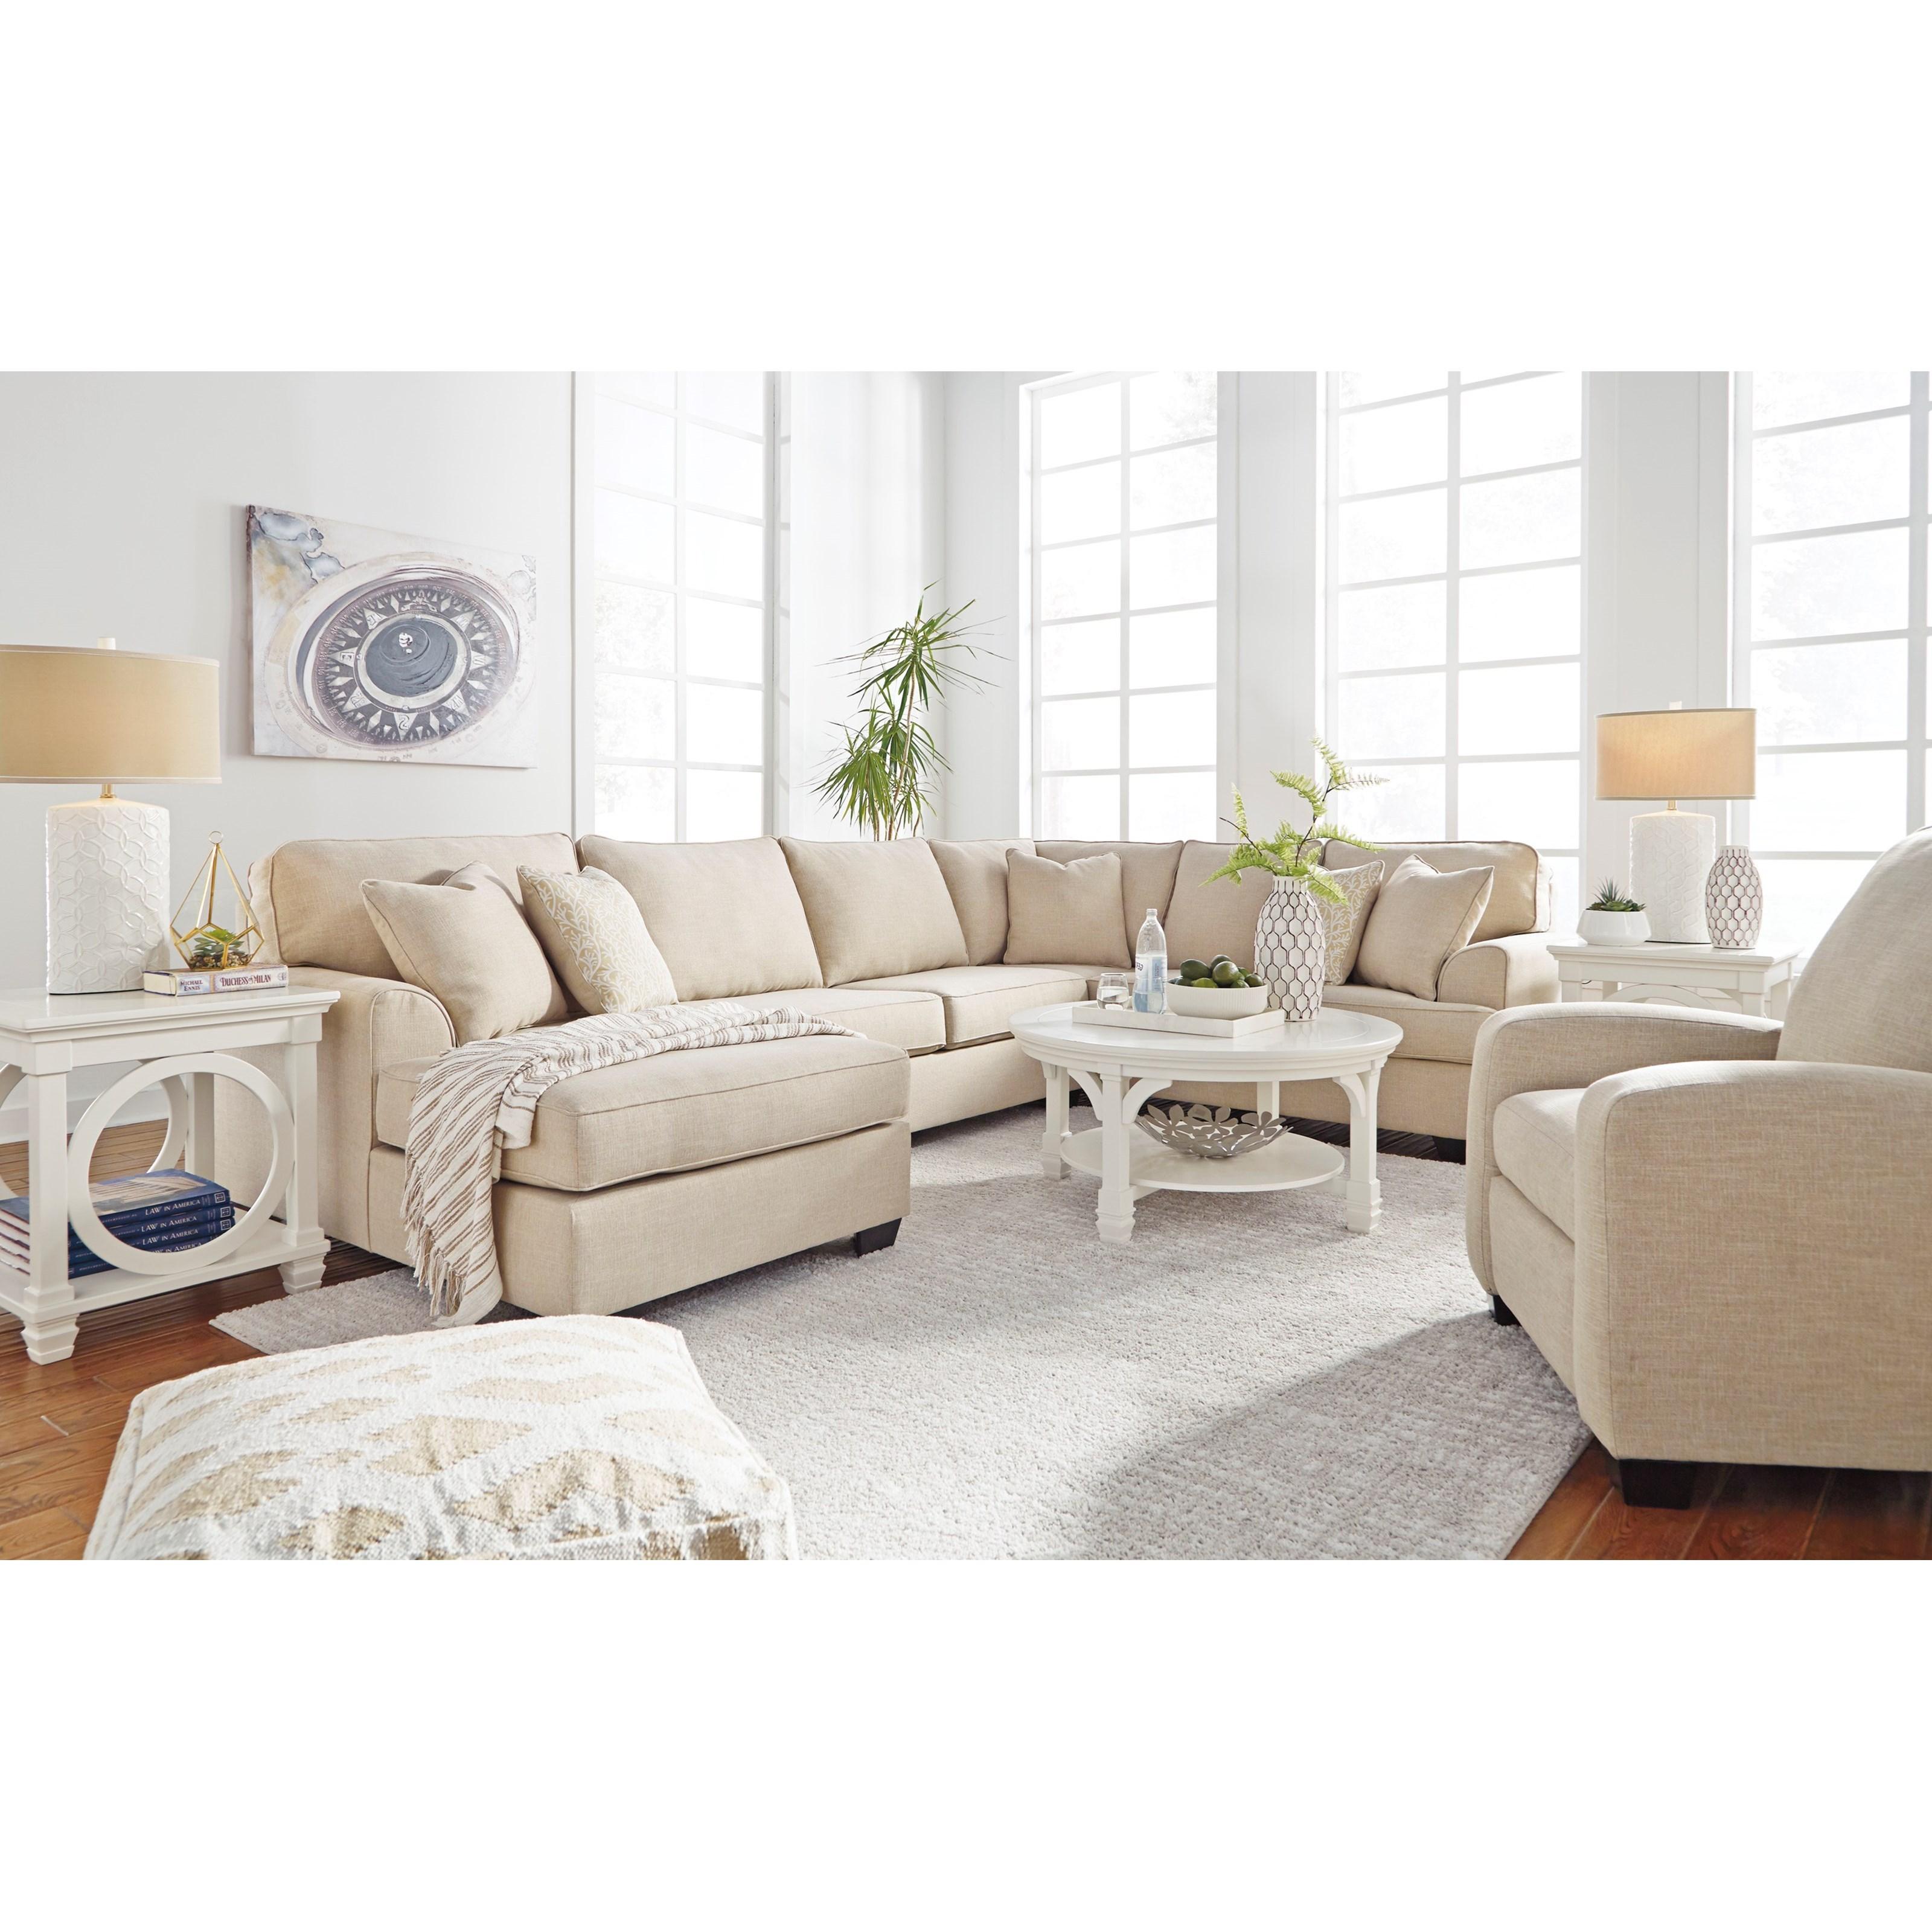 Benchcraft Brioni Nuvella Stationary Living Room Group - Item Number: 62305 Living Room Group 10